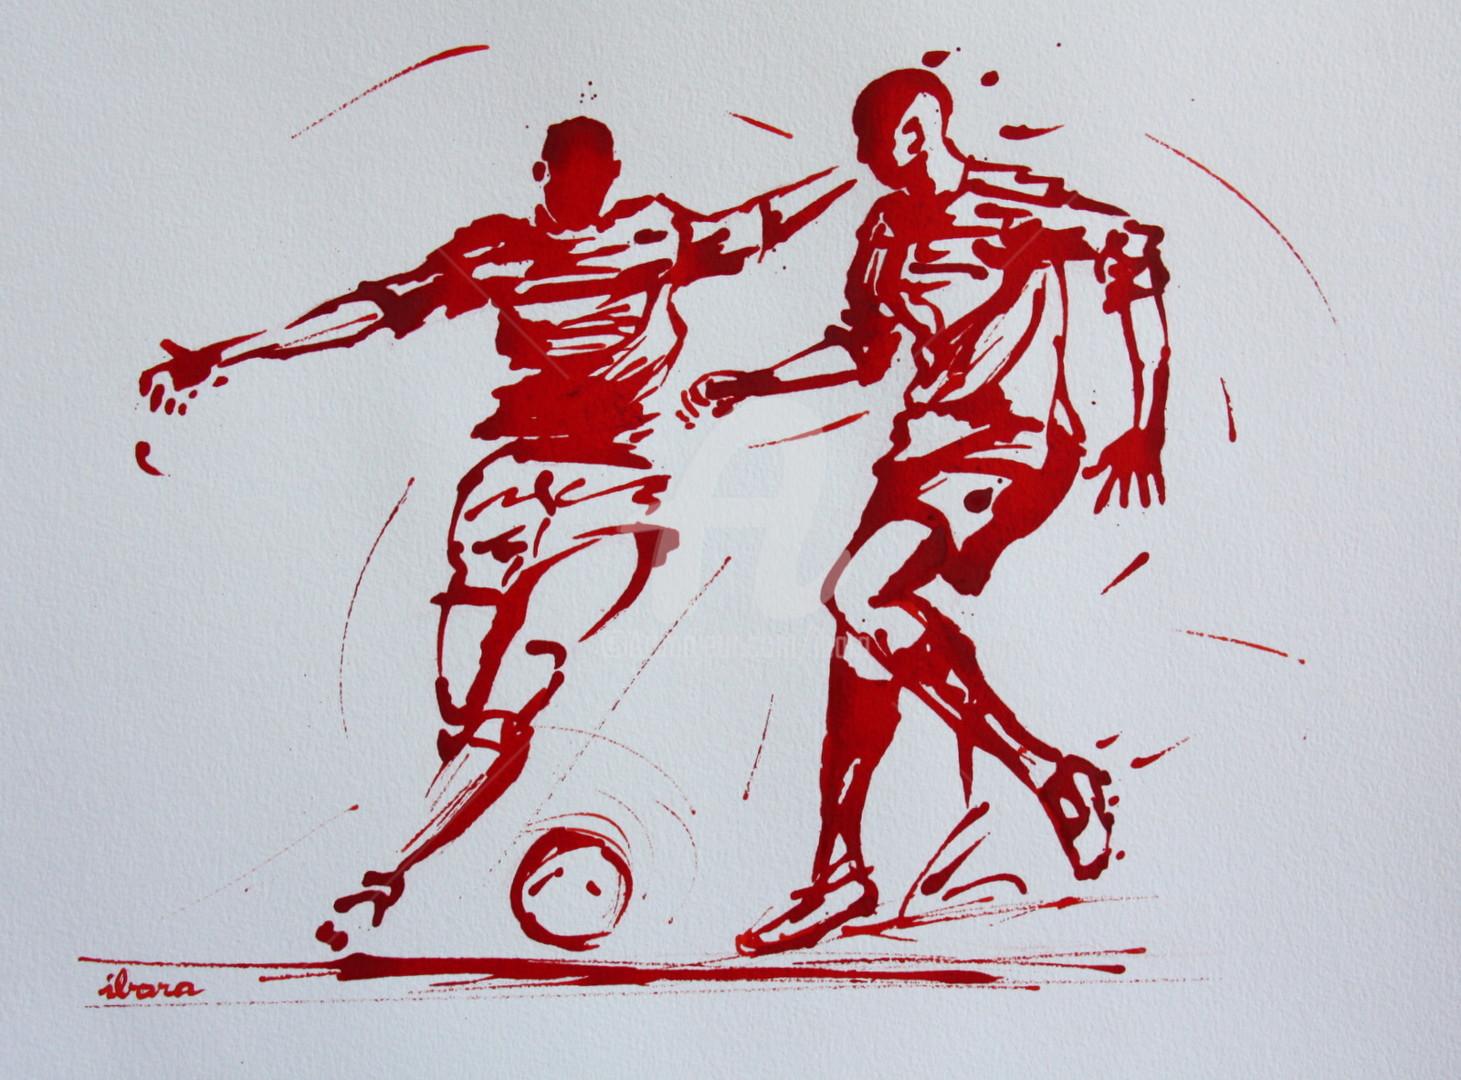 Henri Ibara - football-n-87-dessin-d-ibara-a-l-encre-rouge-sur-papier-aquarelle-300gr-format-30cm-sur-42cm.jpg